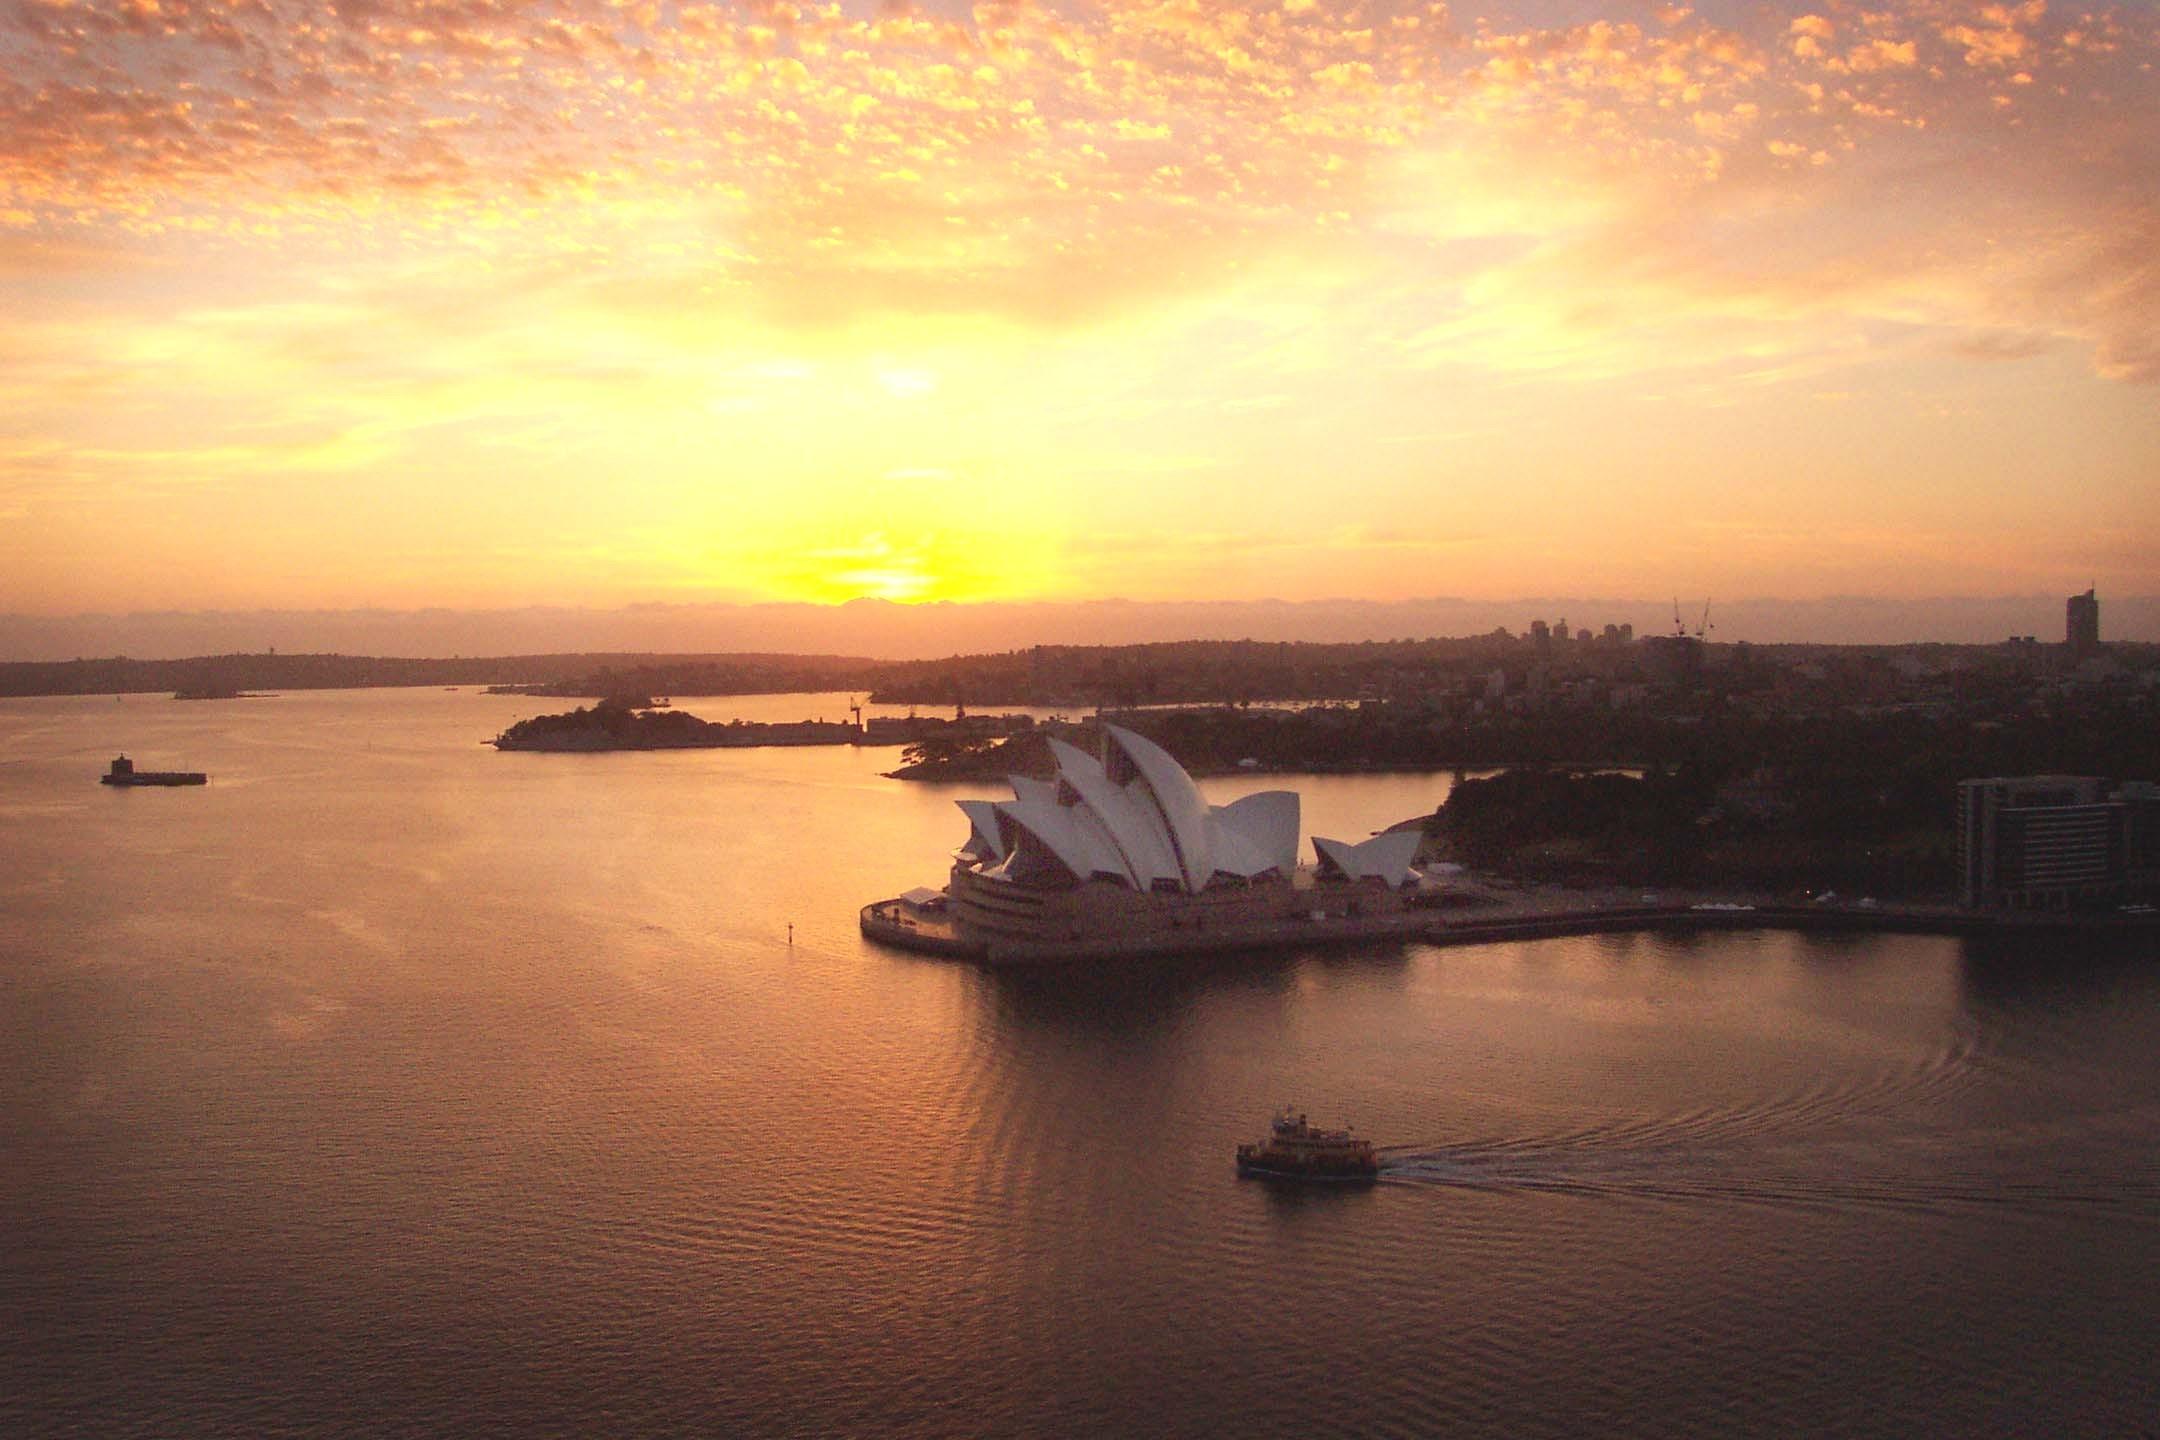 bridgeclimb-dawn-climb-sydney-opera-house